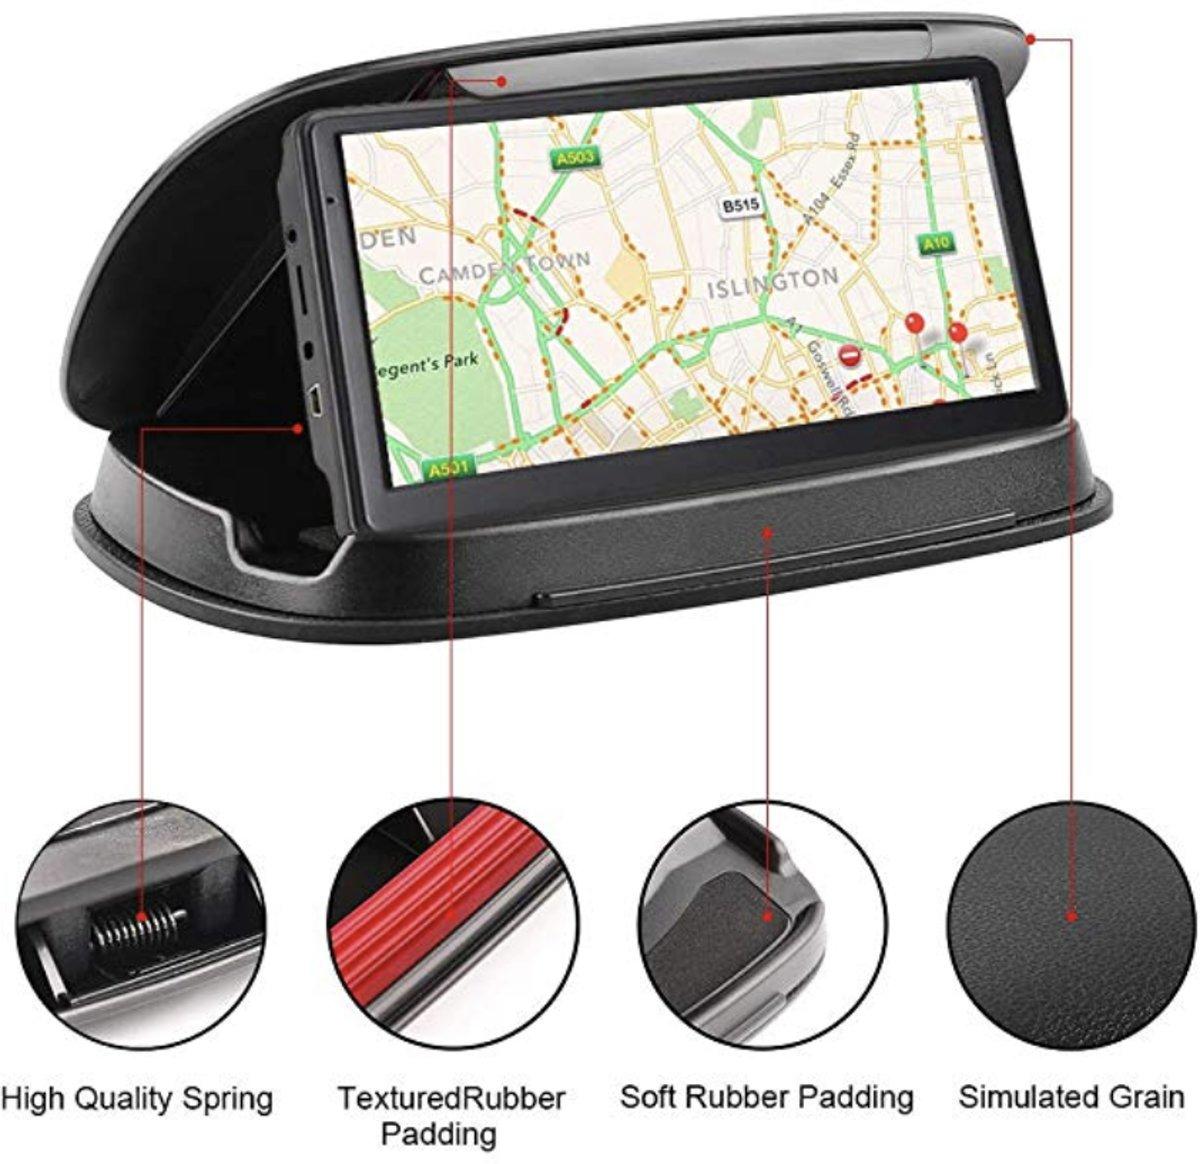 Nieuw Luxe Auto telefoon houder - Dashboard houder , dashboard bevestiging ,  anti slip Beanbag -  autohouder ultra luxe voor Garmin Nuvi TomTom iPhone Samsung - Rheme kopen